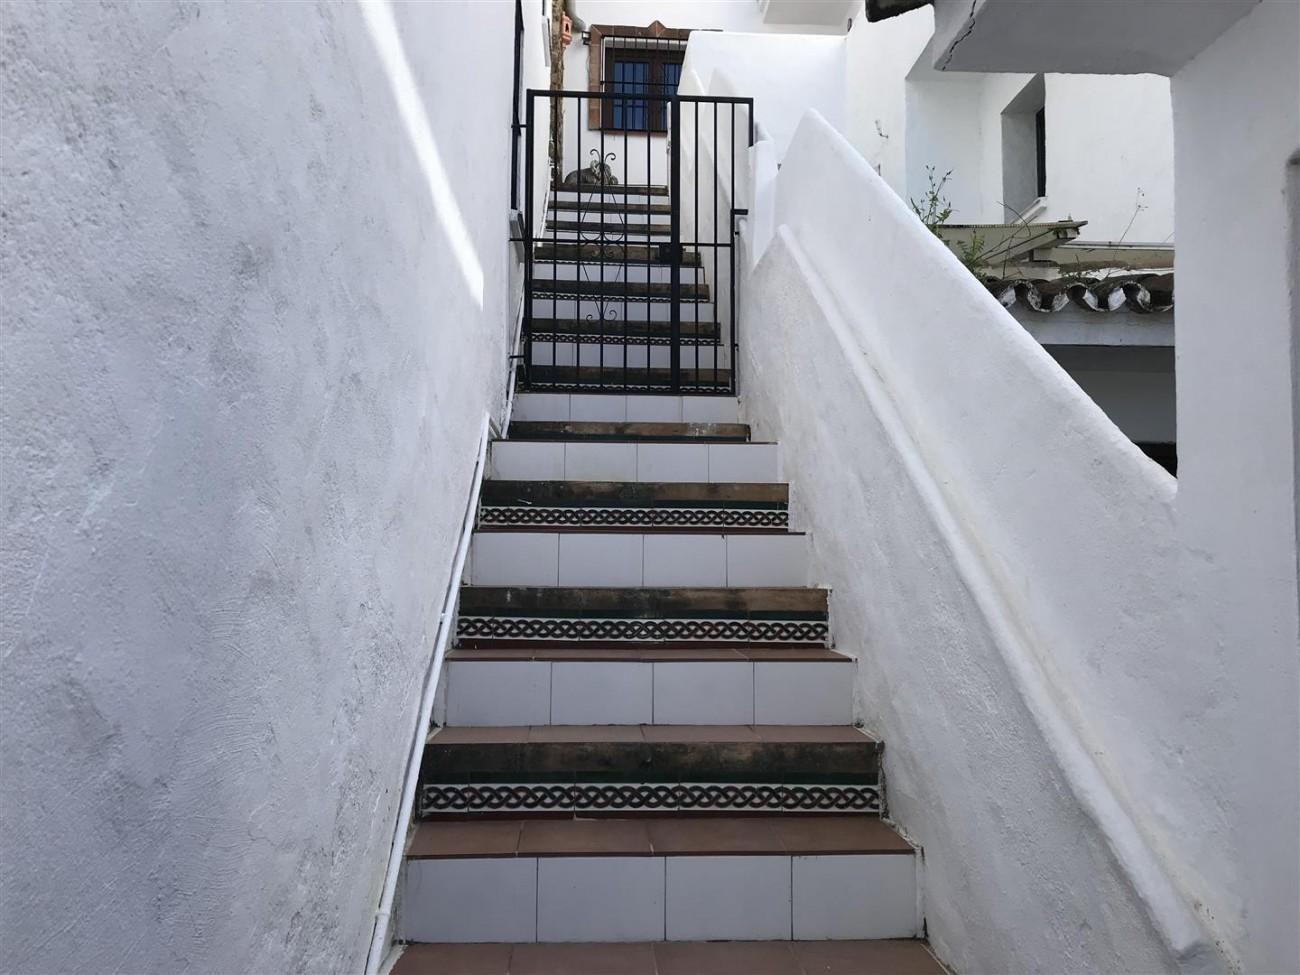 Townhouse for sale cloe to Puerto Banus Marbella Spain (2)